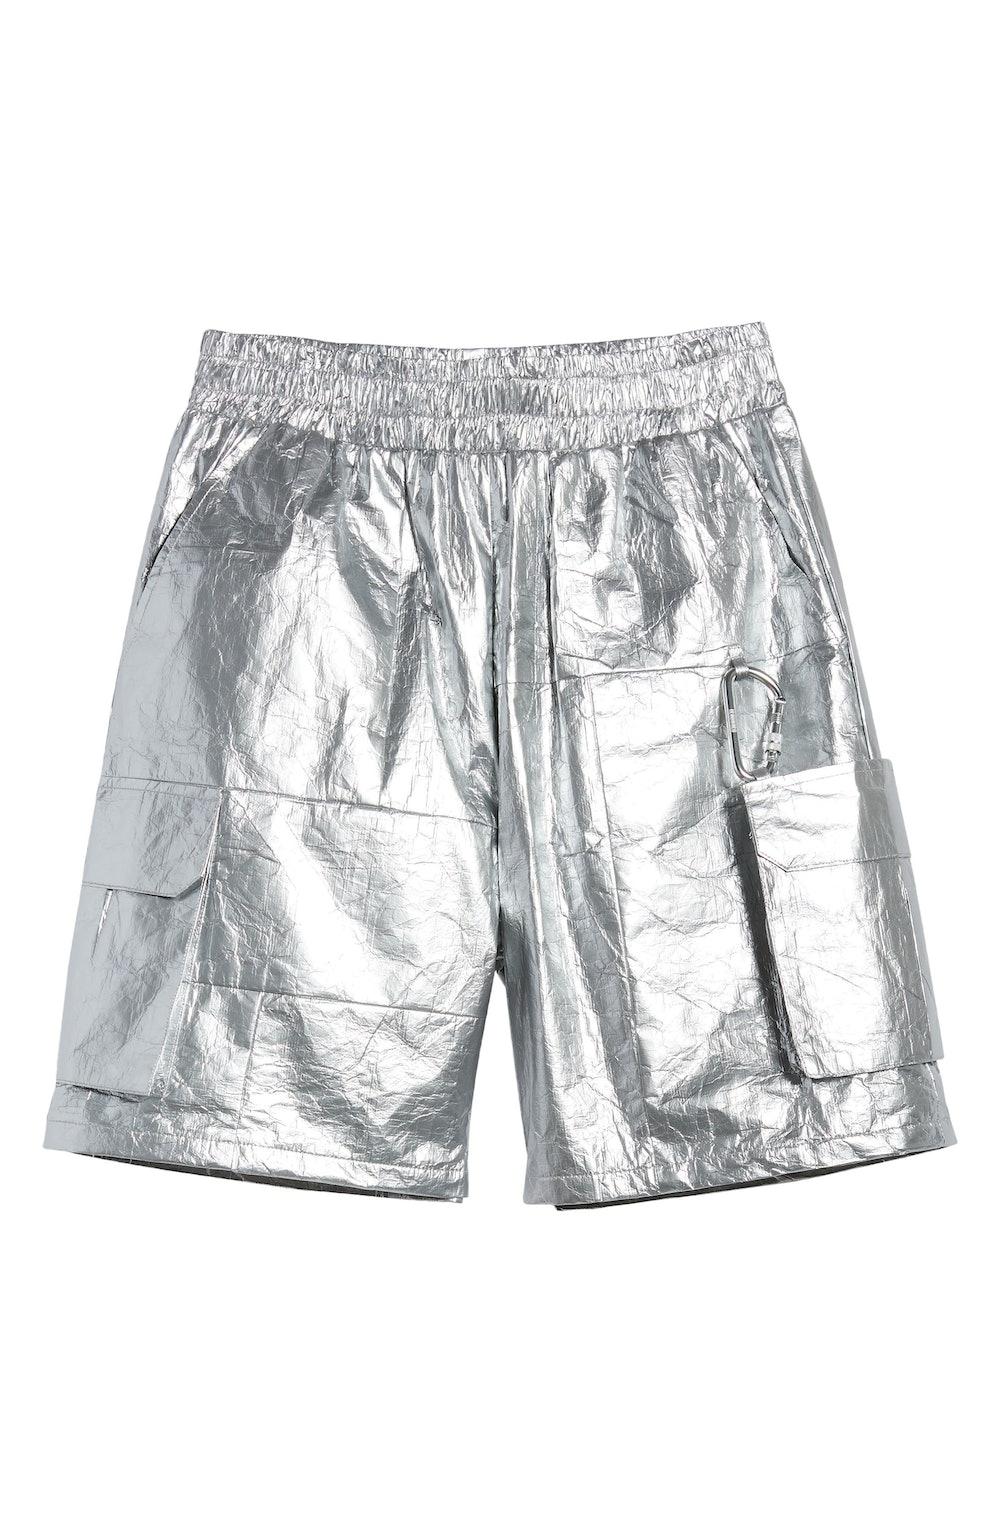 Carabiner Shorts